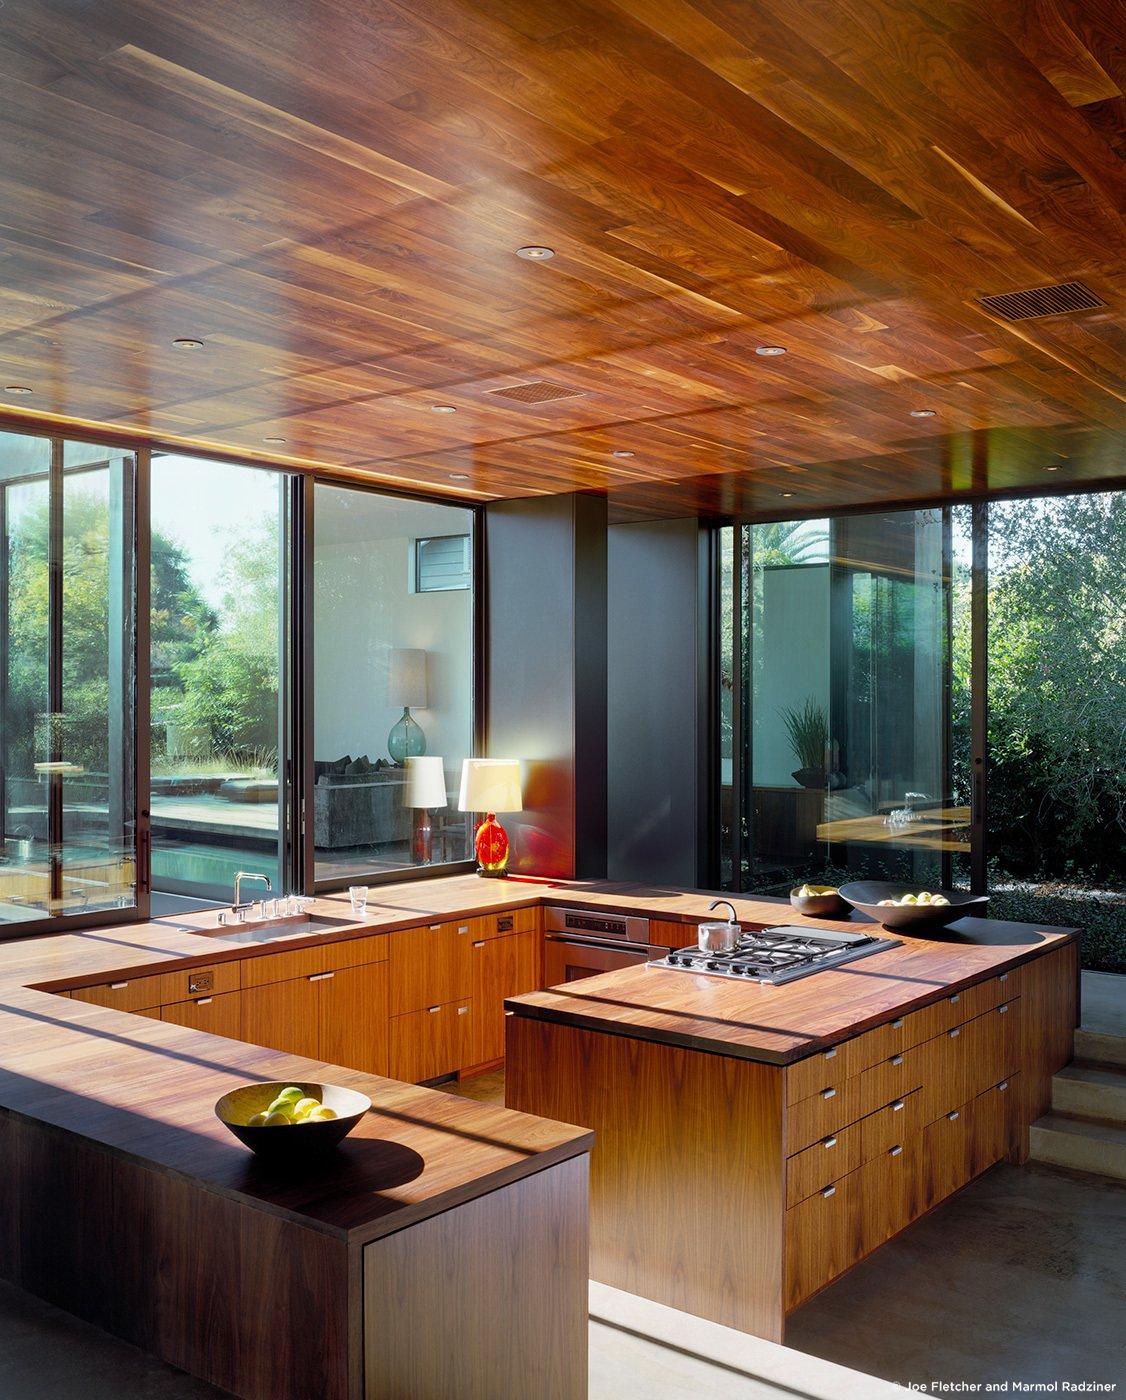 #ViennaWayResidence #modern #midcentury #inside #interior #windows #lighting #dining #wood #table #seating #kitchen #storage #naturallight #Venice #California #MarmolRadziner  Vienna Way Residence